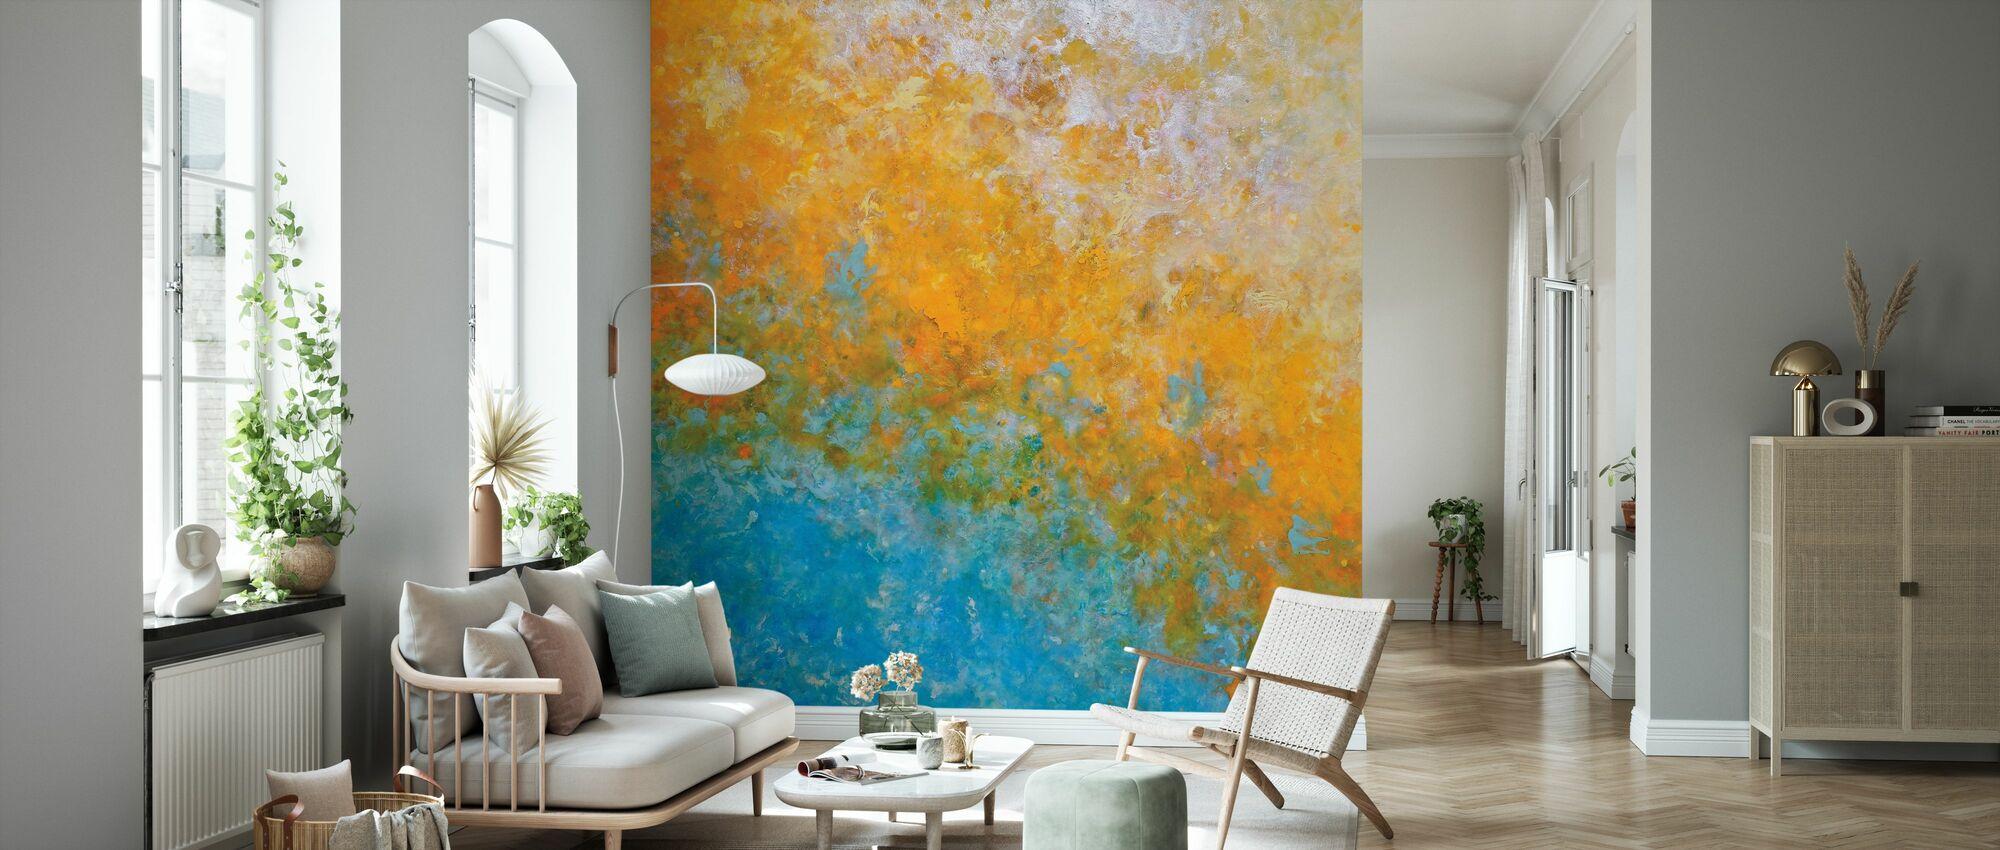 Trade Winds - Wallpaper - Living Room